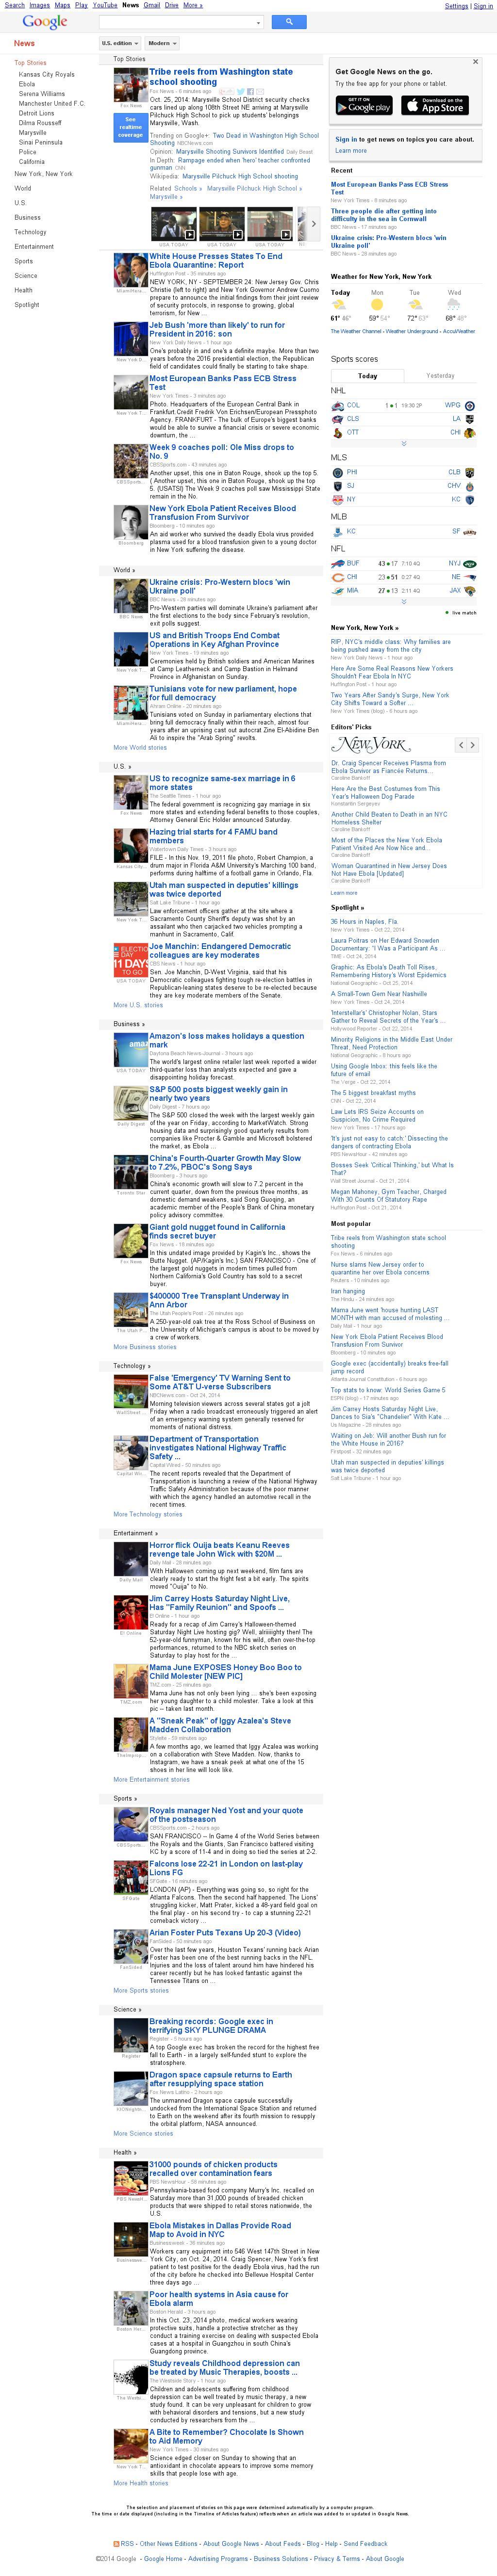 Google News at Sunday Oct. 26, 2014, 8:05 p.m. UTC